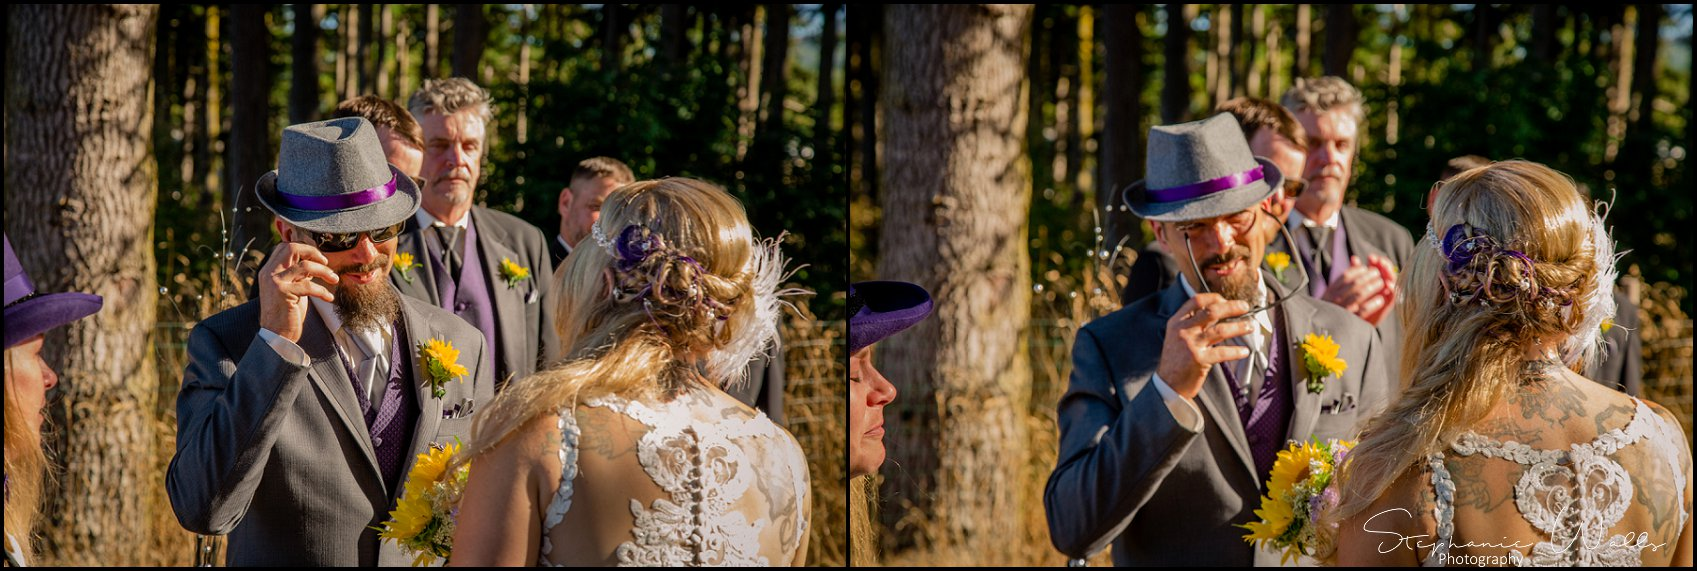 Everist Wedding 162 Patti & Bobbys | Troll Haven Castle & Bandy Farms | Sequim, Wa Wedding Photographer